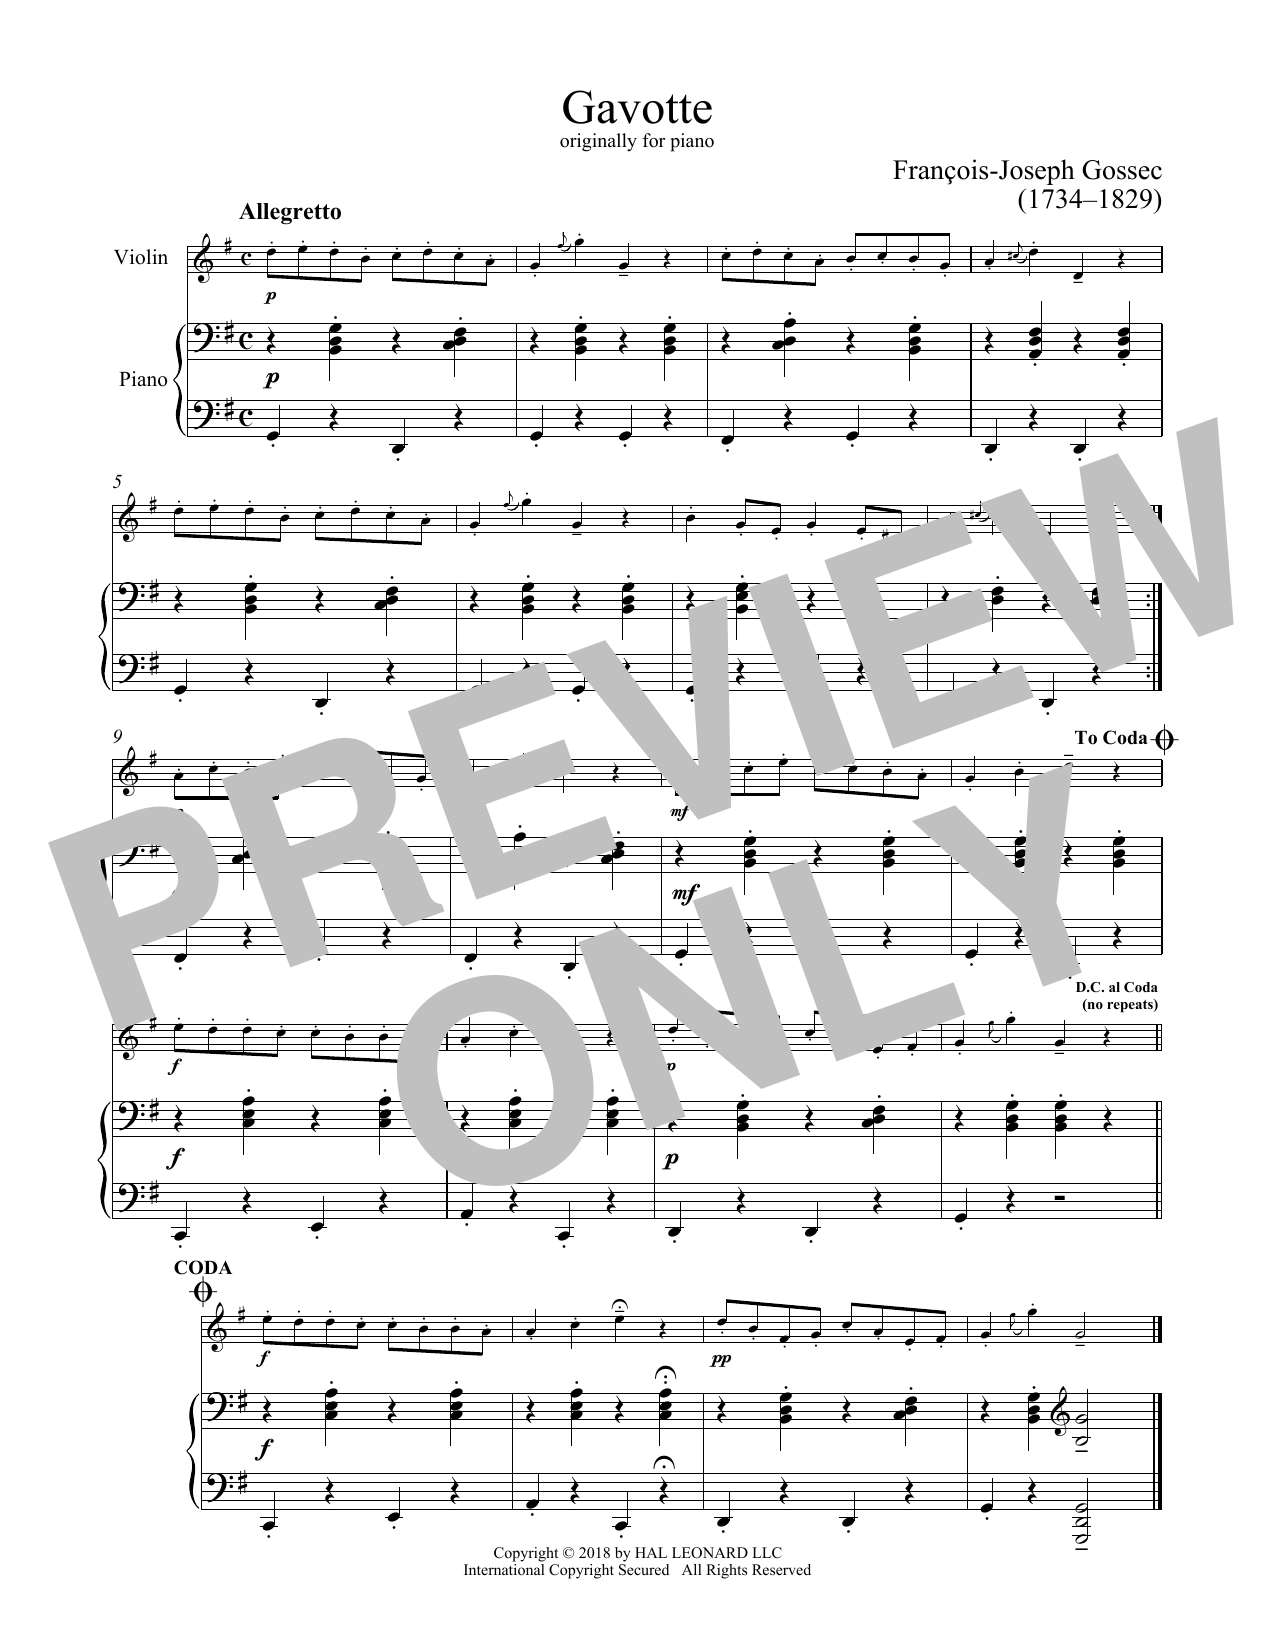 Francois-Joseph Gossec Gavotte sheet music notes and chords. Download Printable PDF.